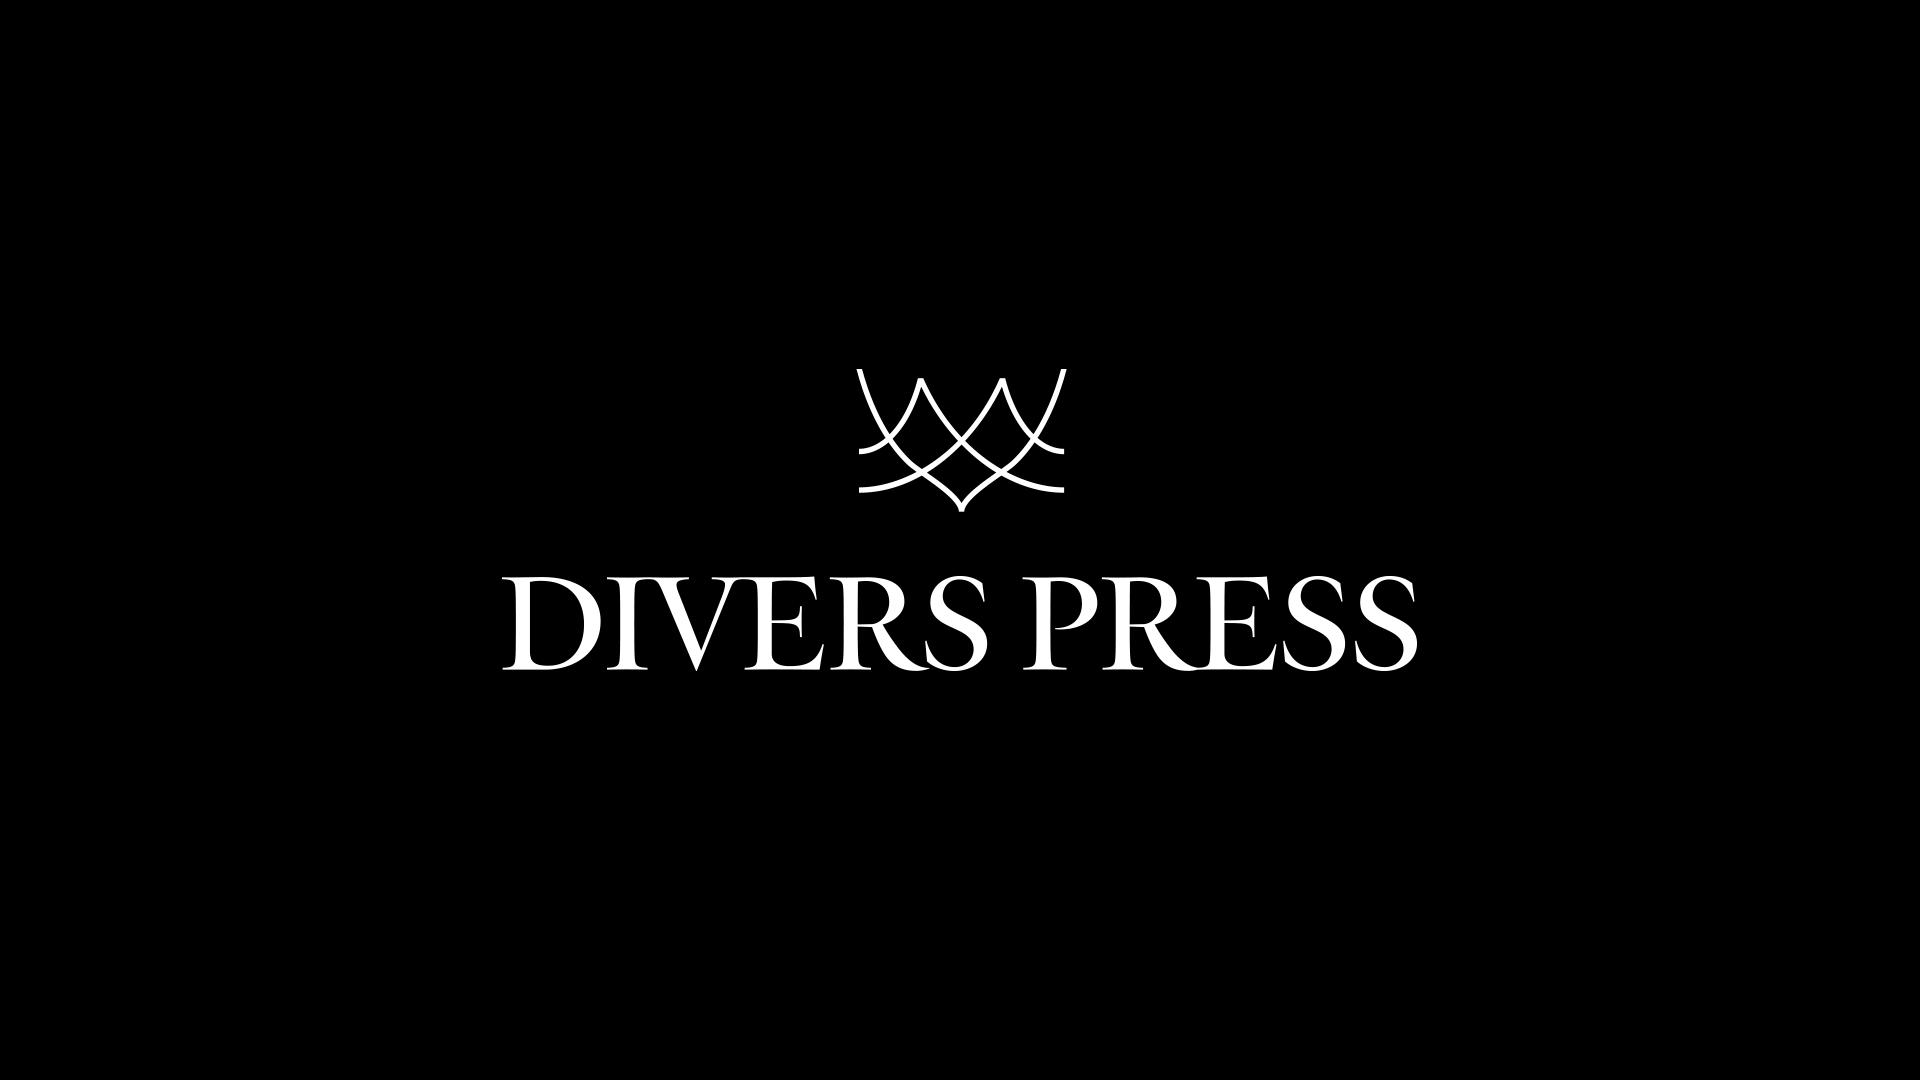 DiversPress-1.png